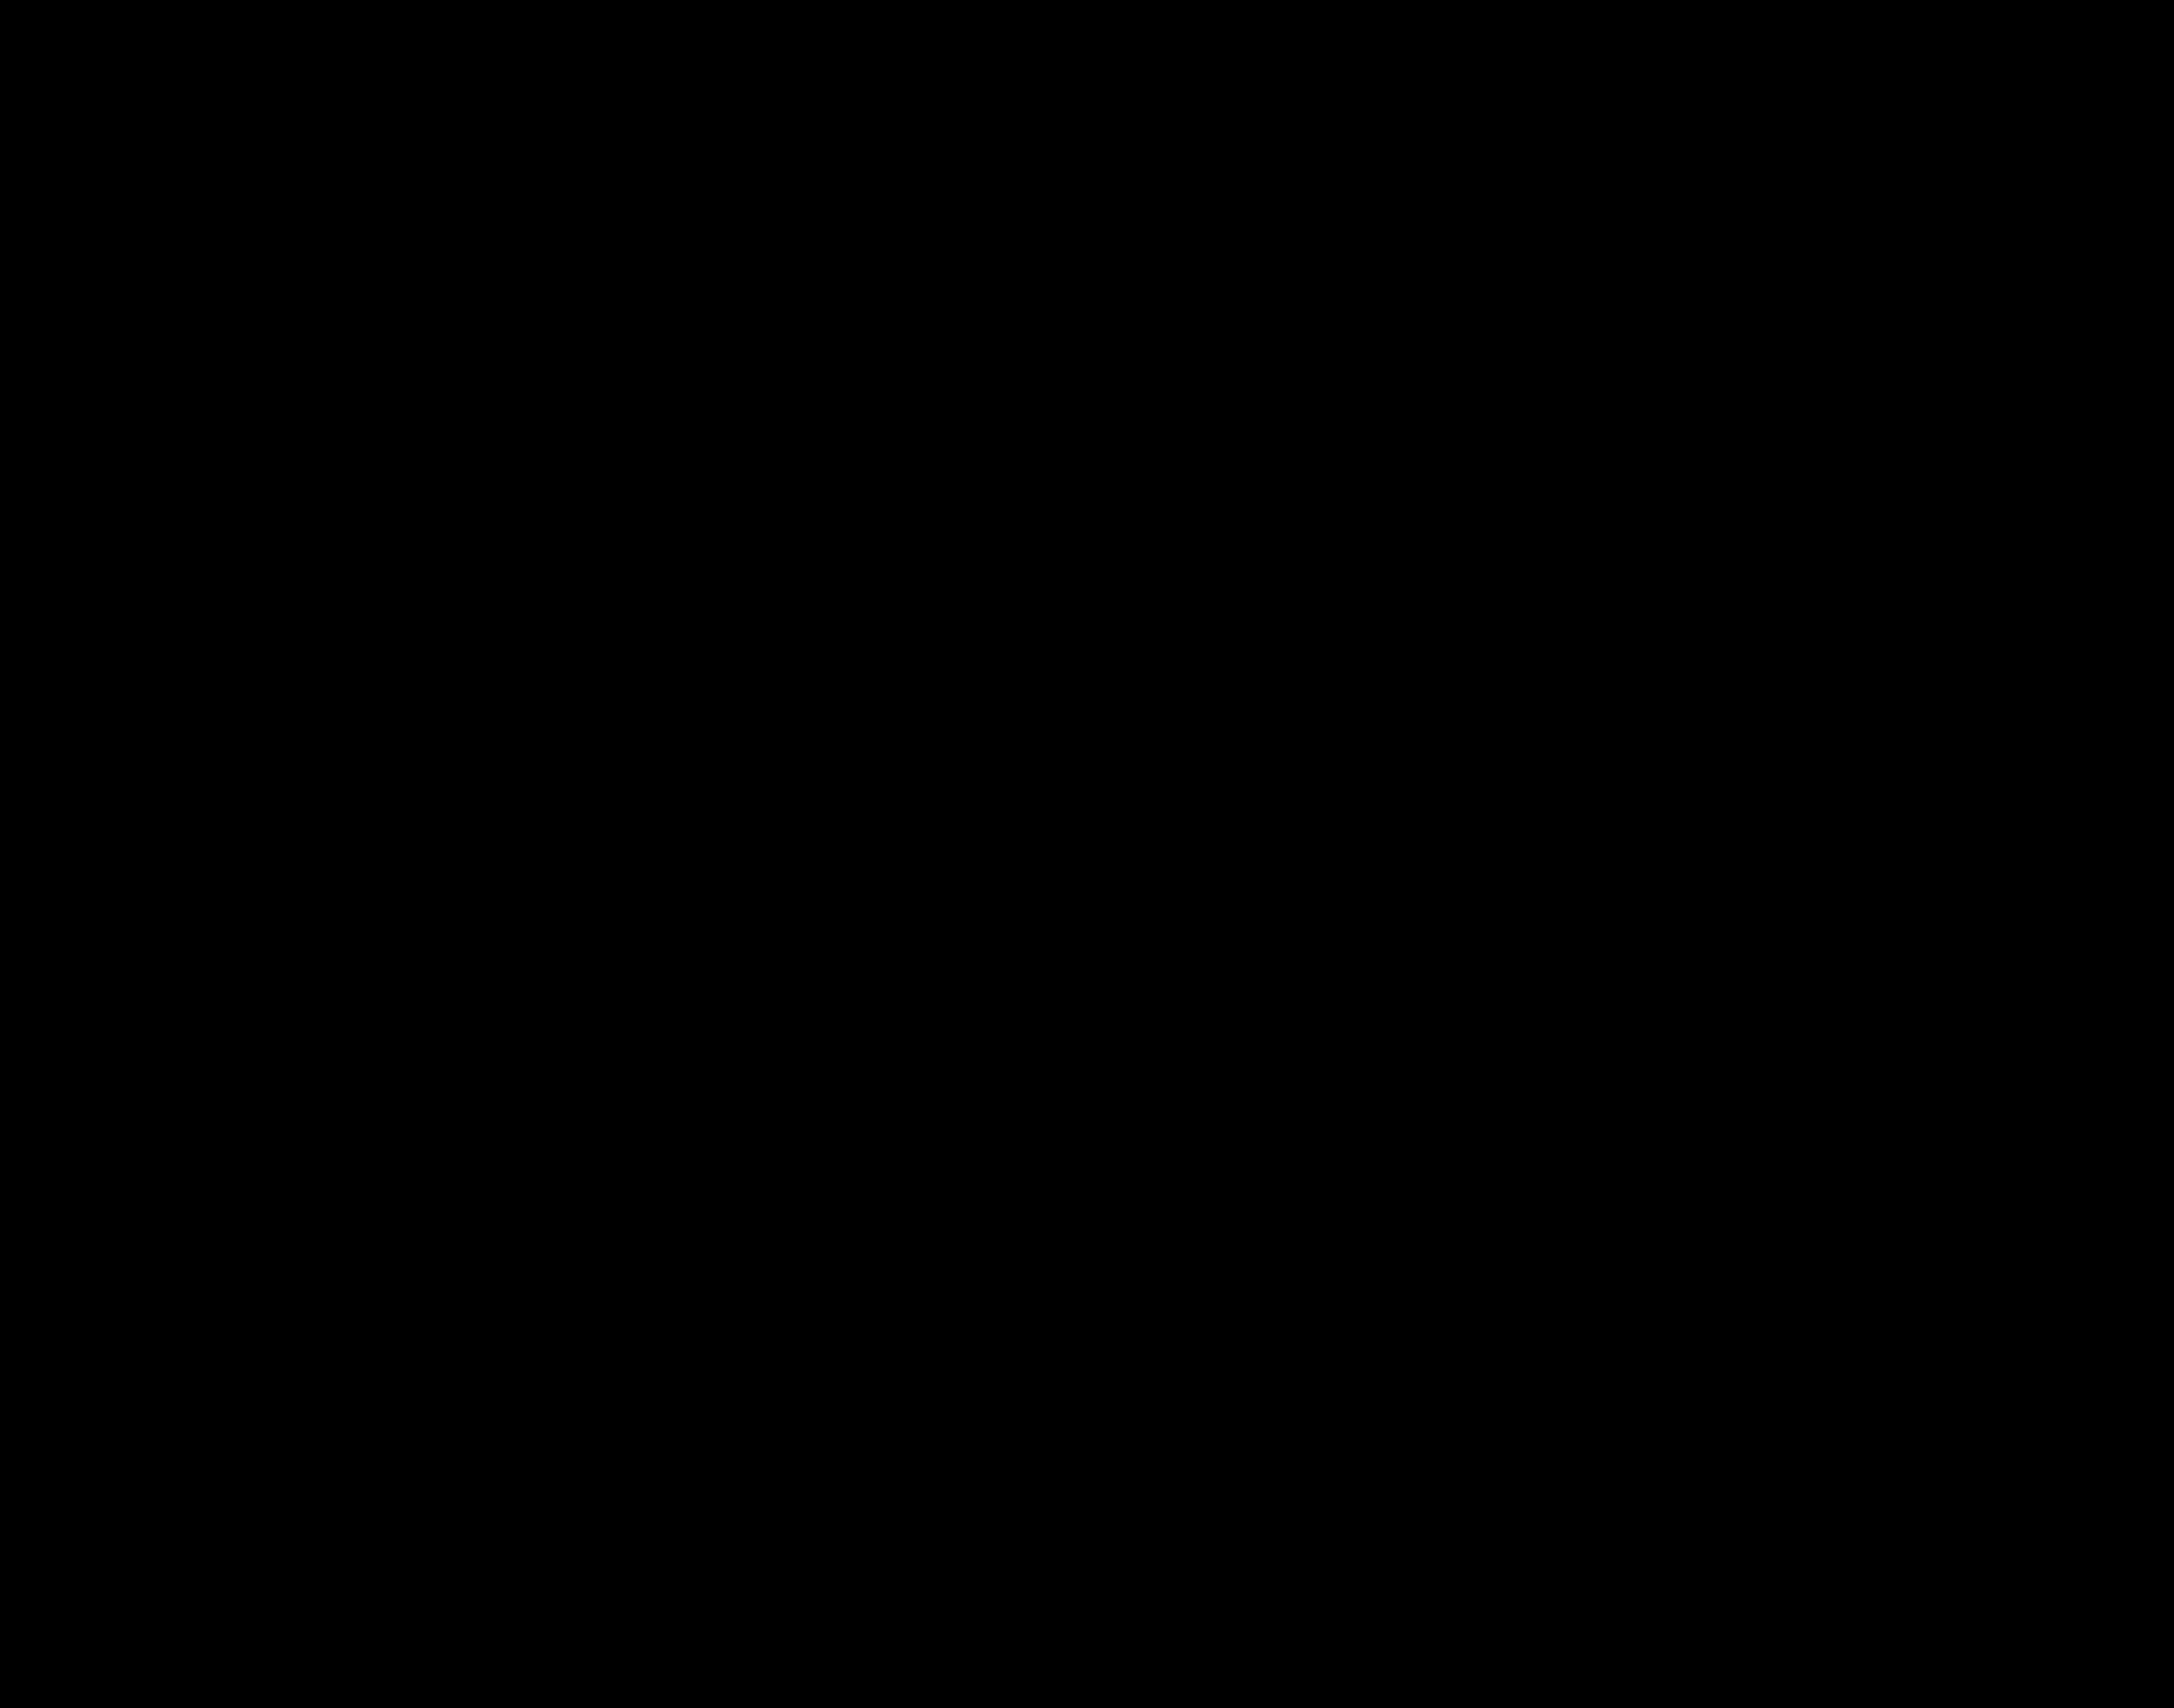 cellar_b828d165-1c22-11ea-8c1f-01aa75ed71a1.0004.02_doc_2-1